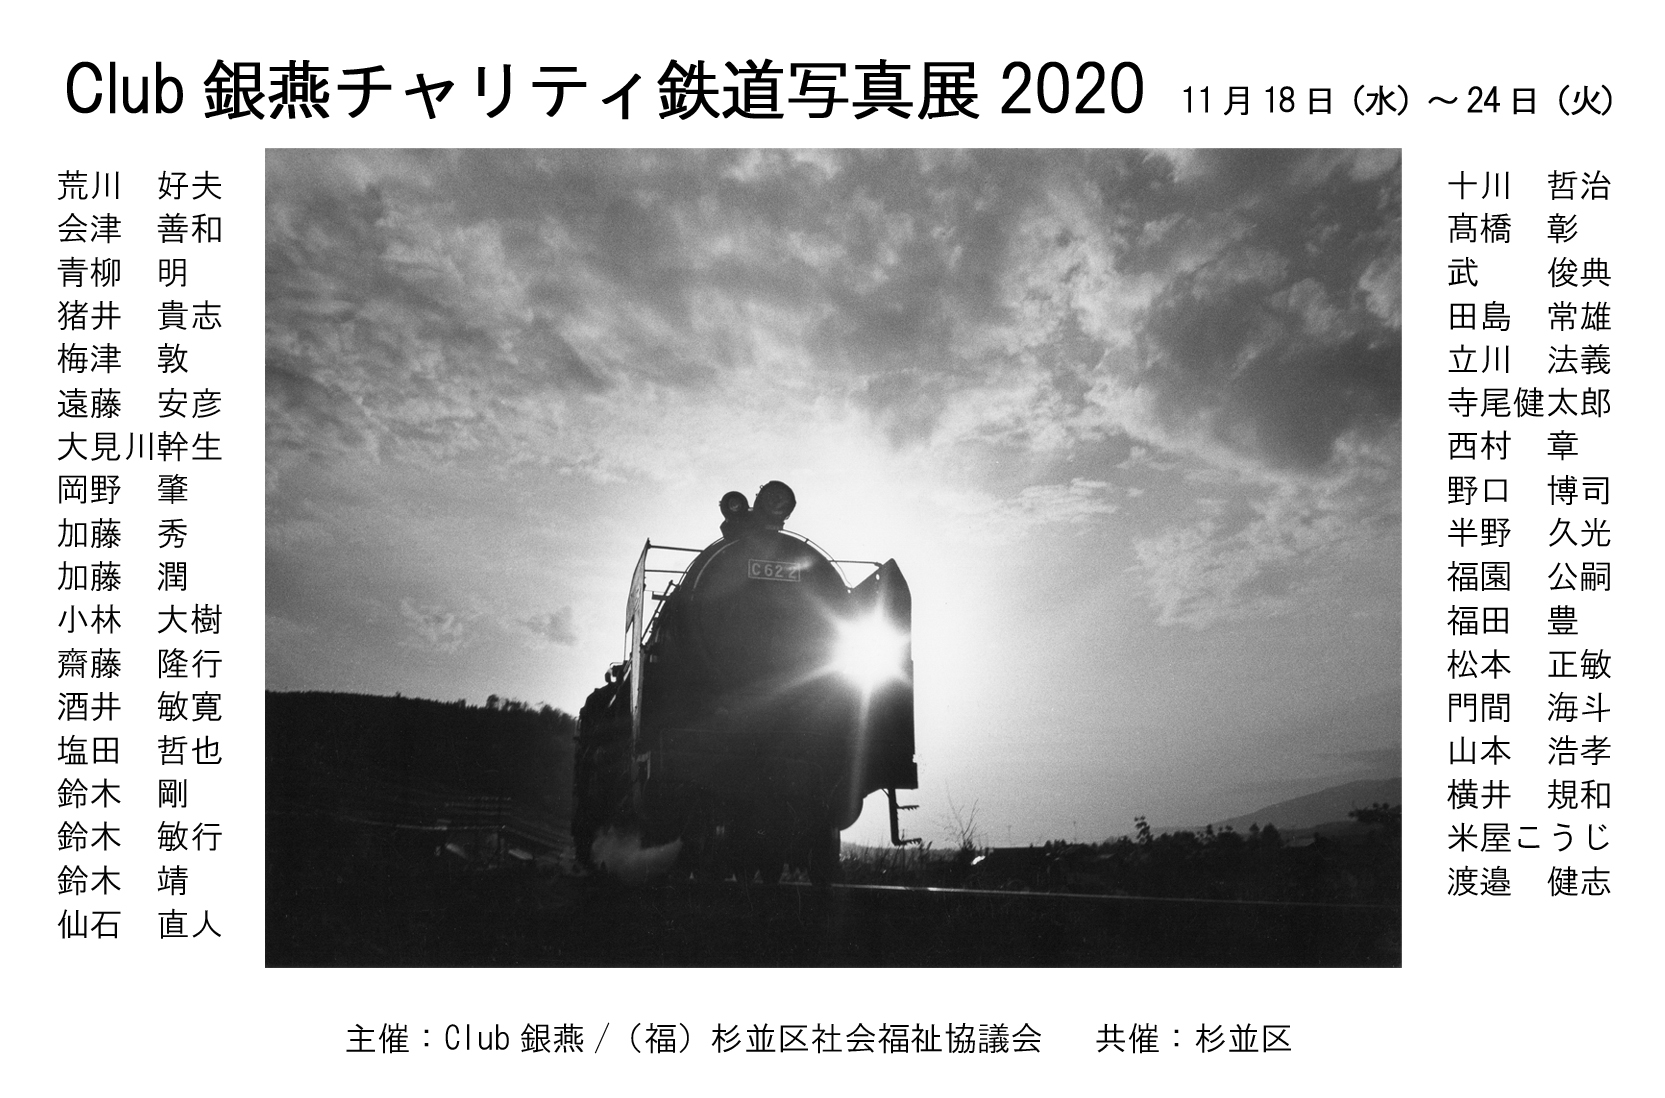 Club銀燕チャリティ鉄道写真展2020